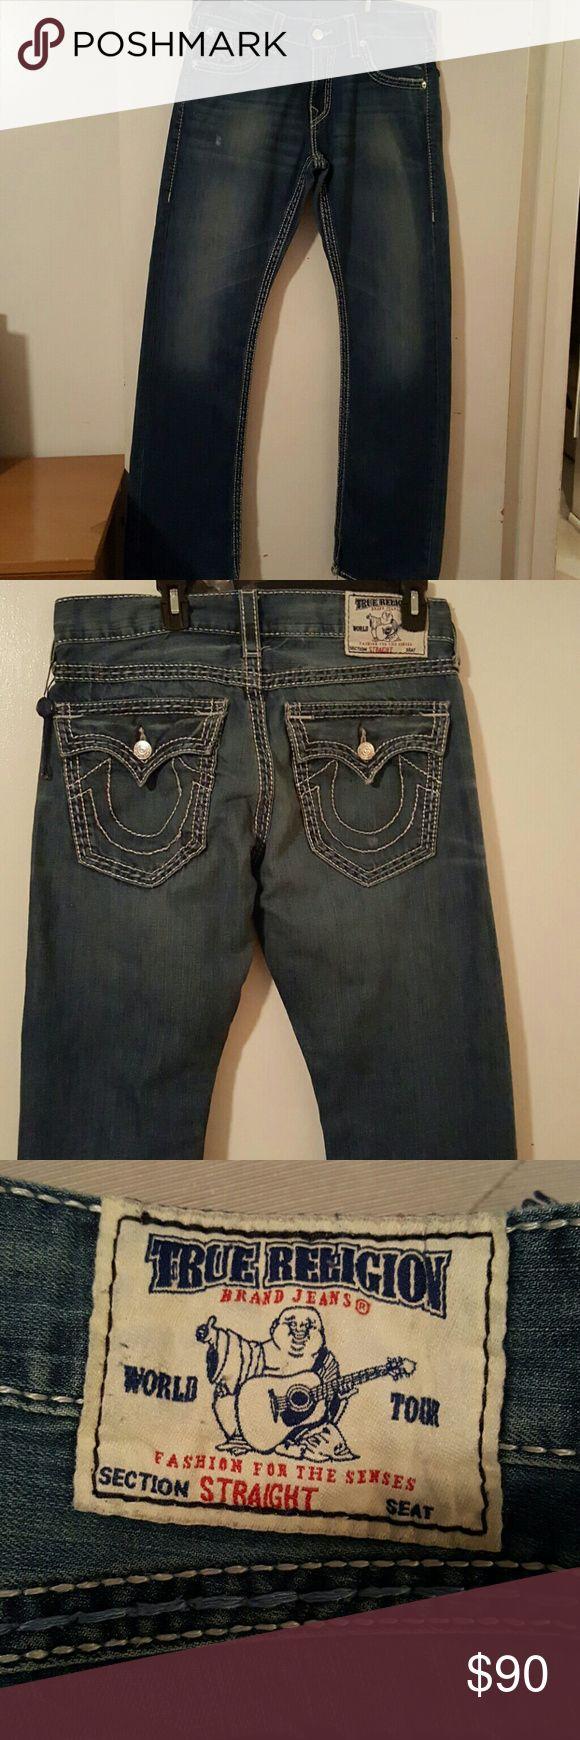 TRUE RELIGION...MEN'S JEANS...AUTHENTIC True Religion..Men's Jeans..AUTHENTIC. SIZE 32X32 True Religion Jeans Straight